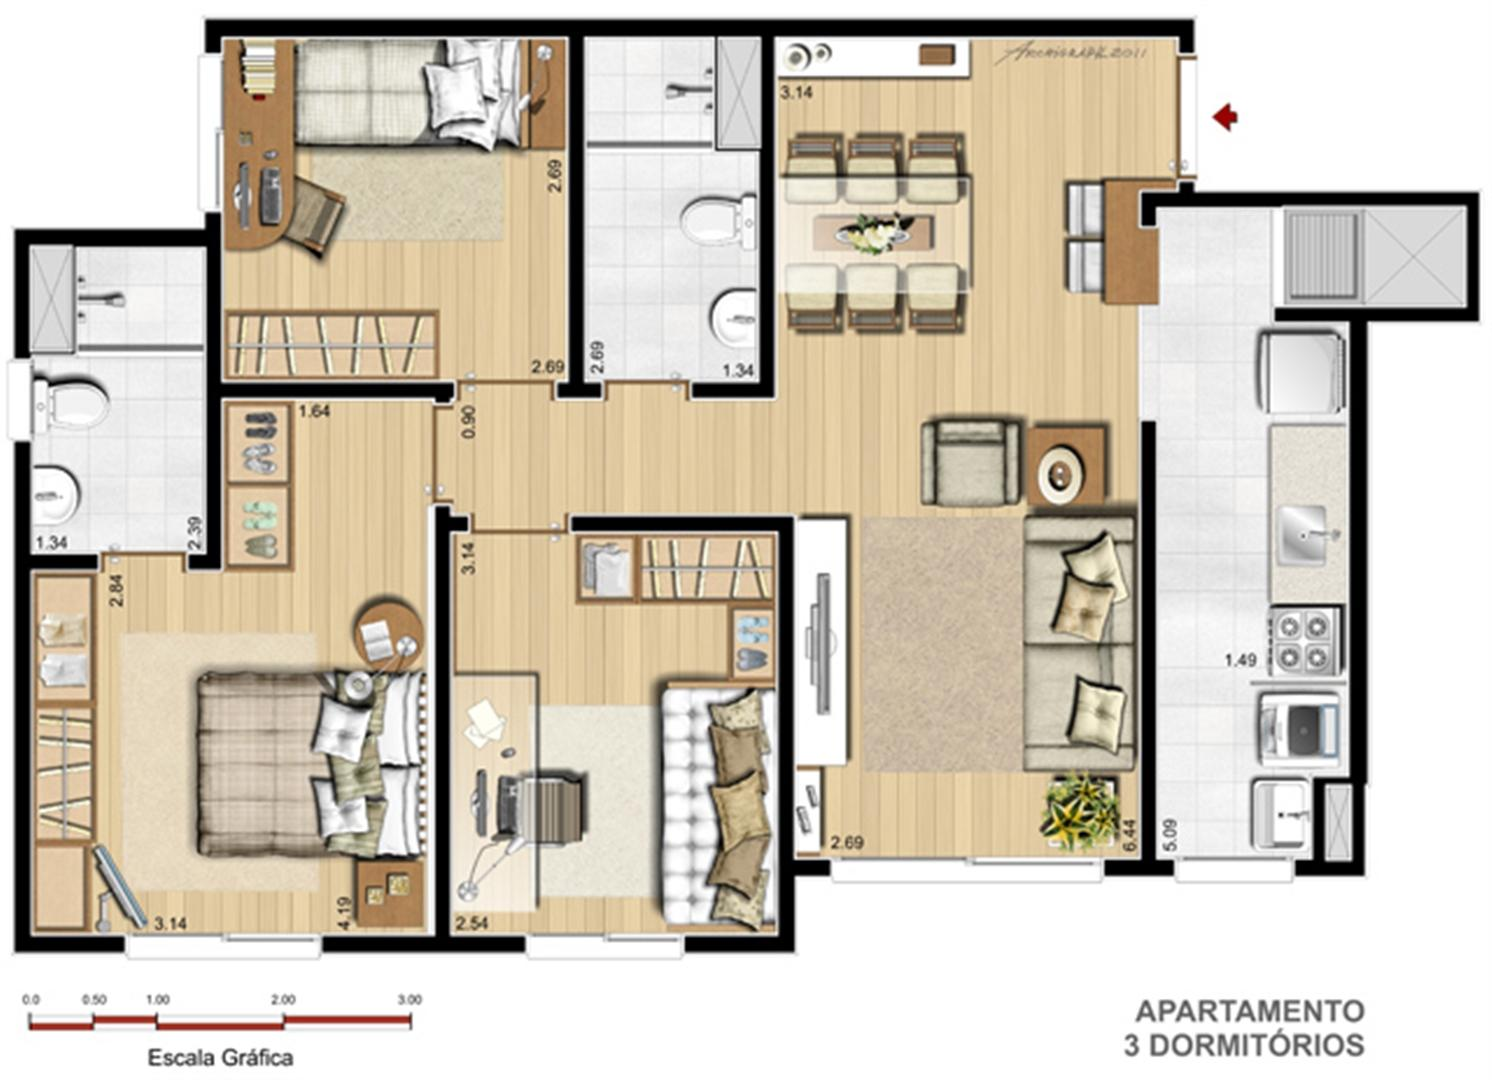 Apto. 3 dorms. com suíte - 70,58 m² | Way – Apartamentono  Partenon - Porto Alegre - Rio Grande do Sul